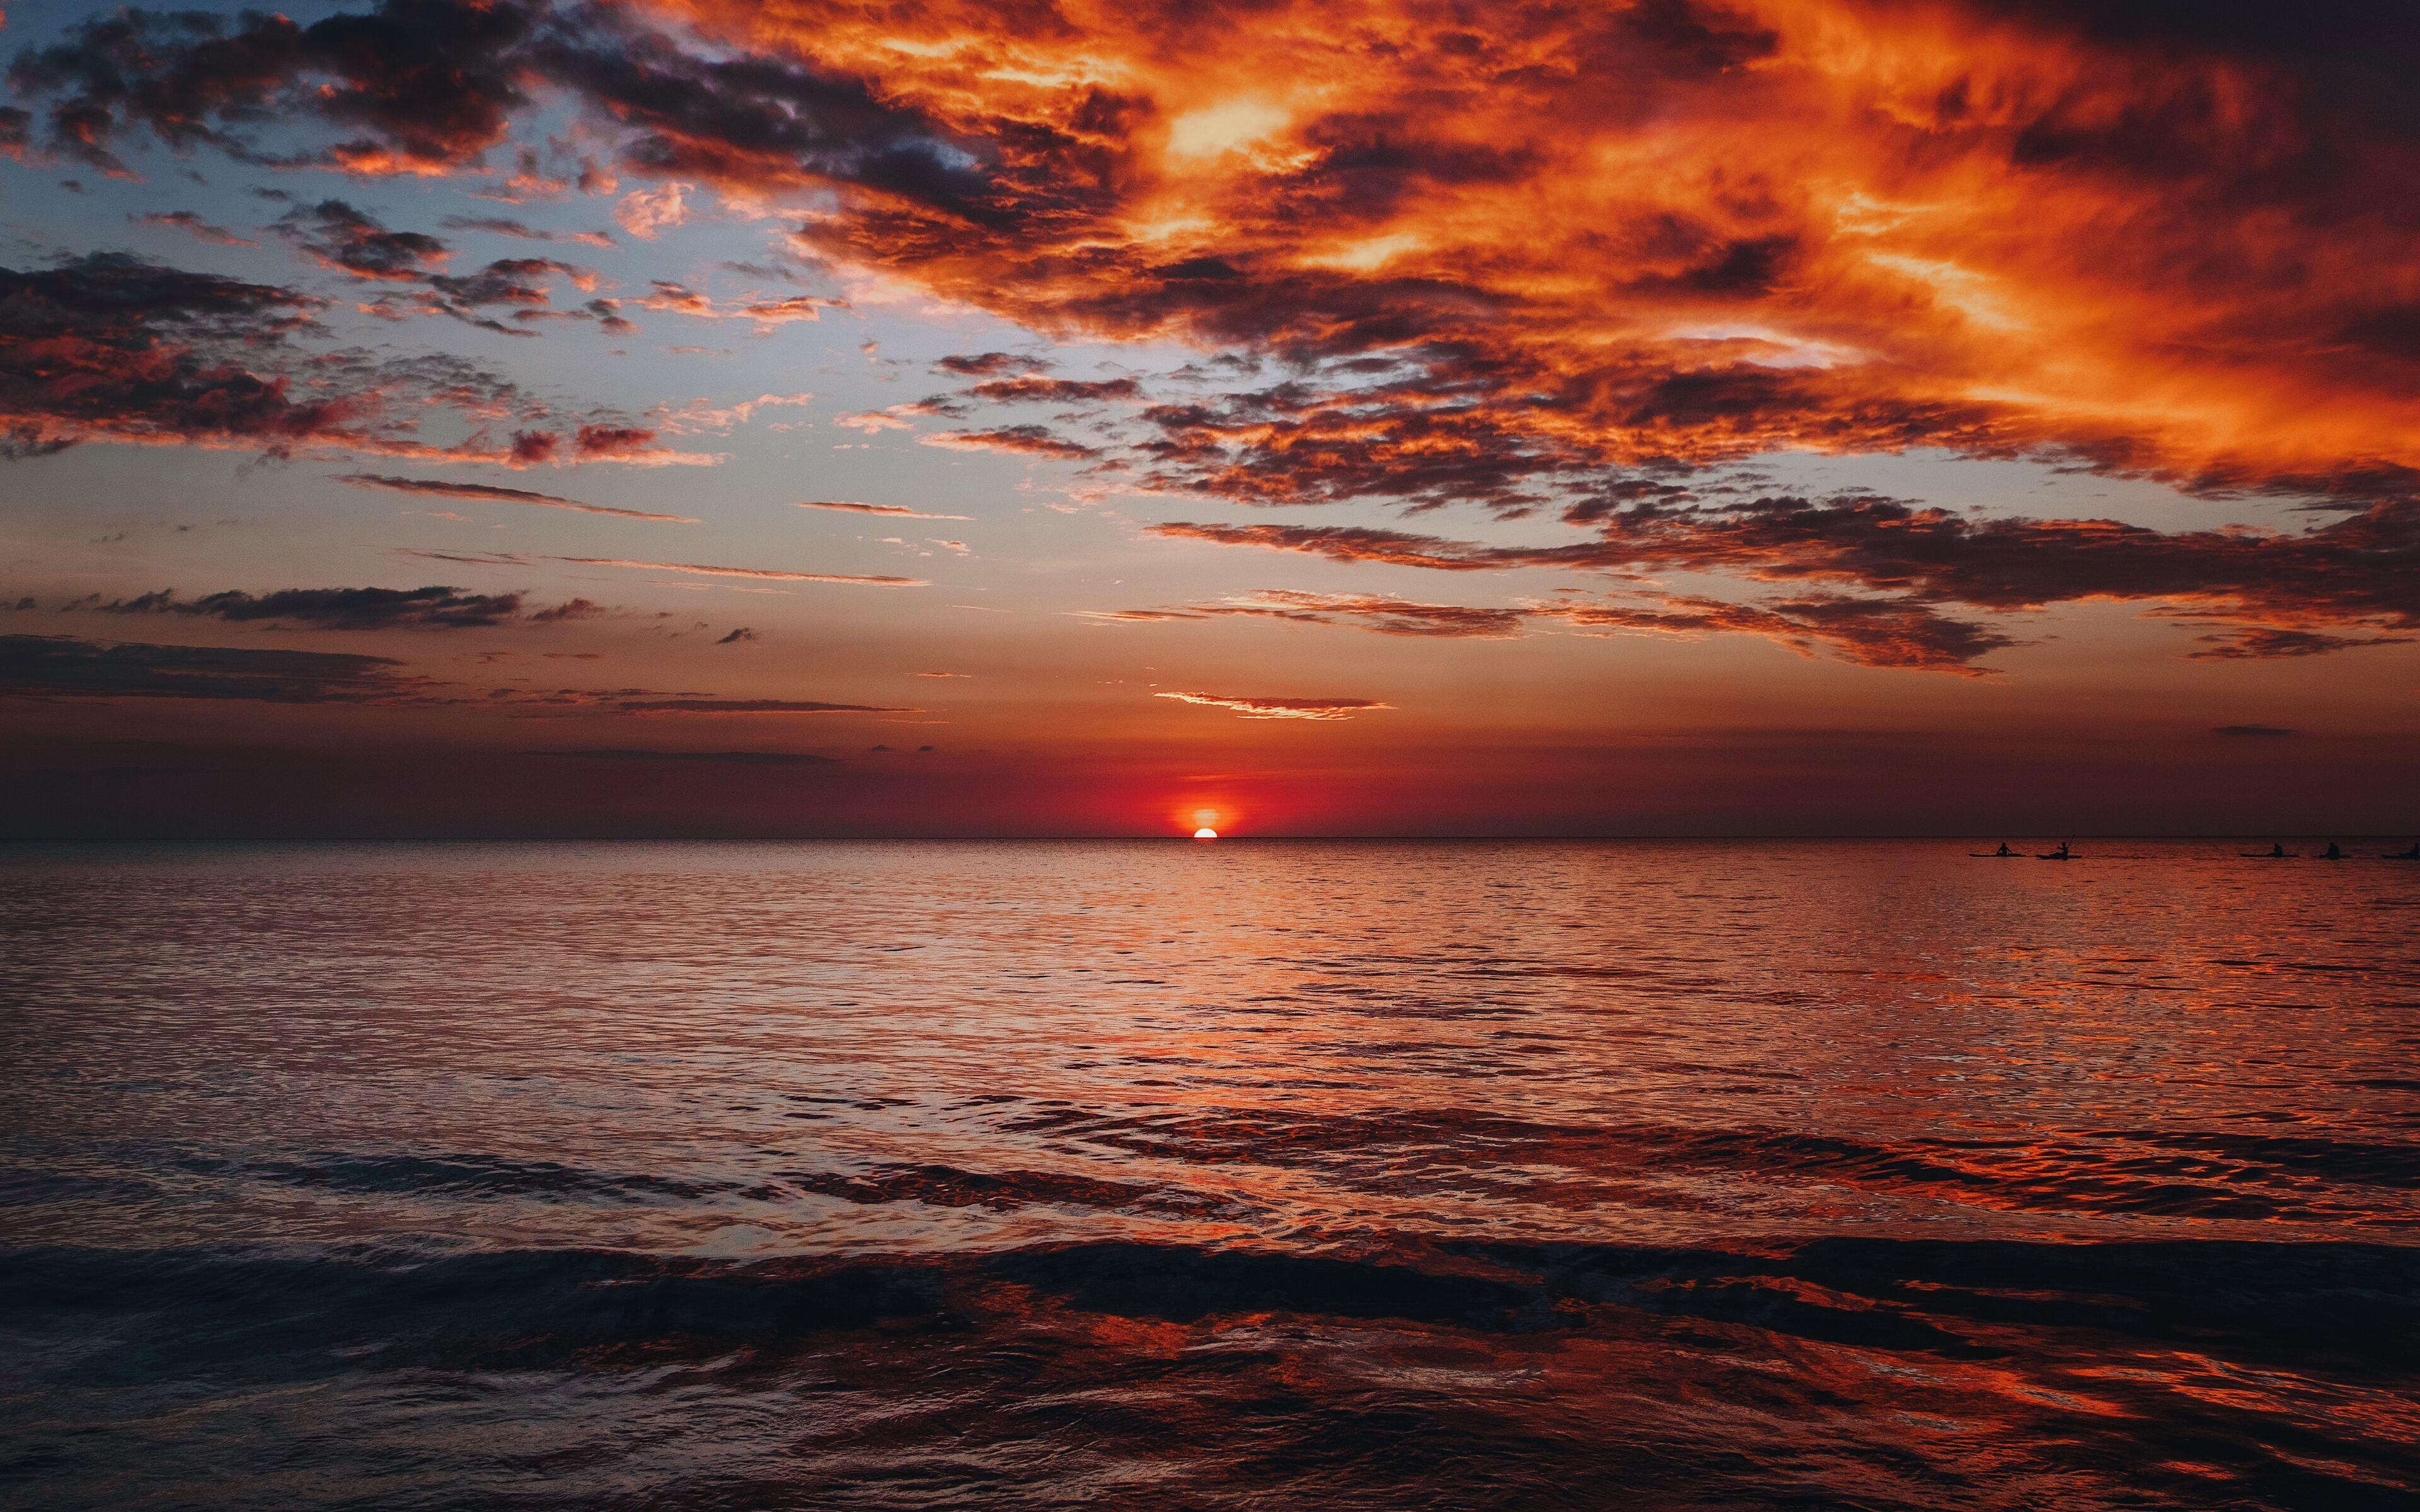 sunset-nature-5k-83.jpg